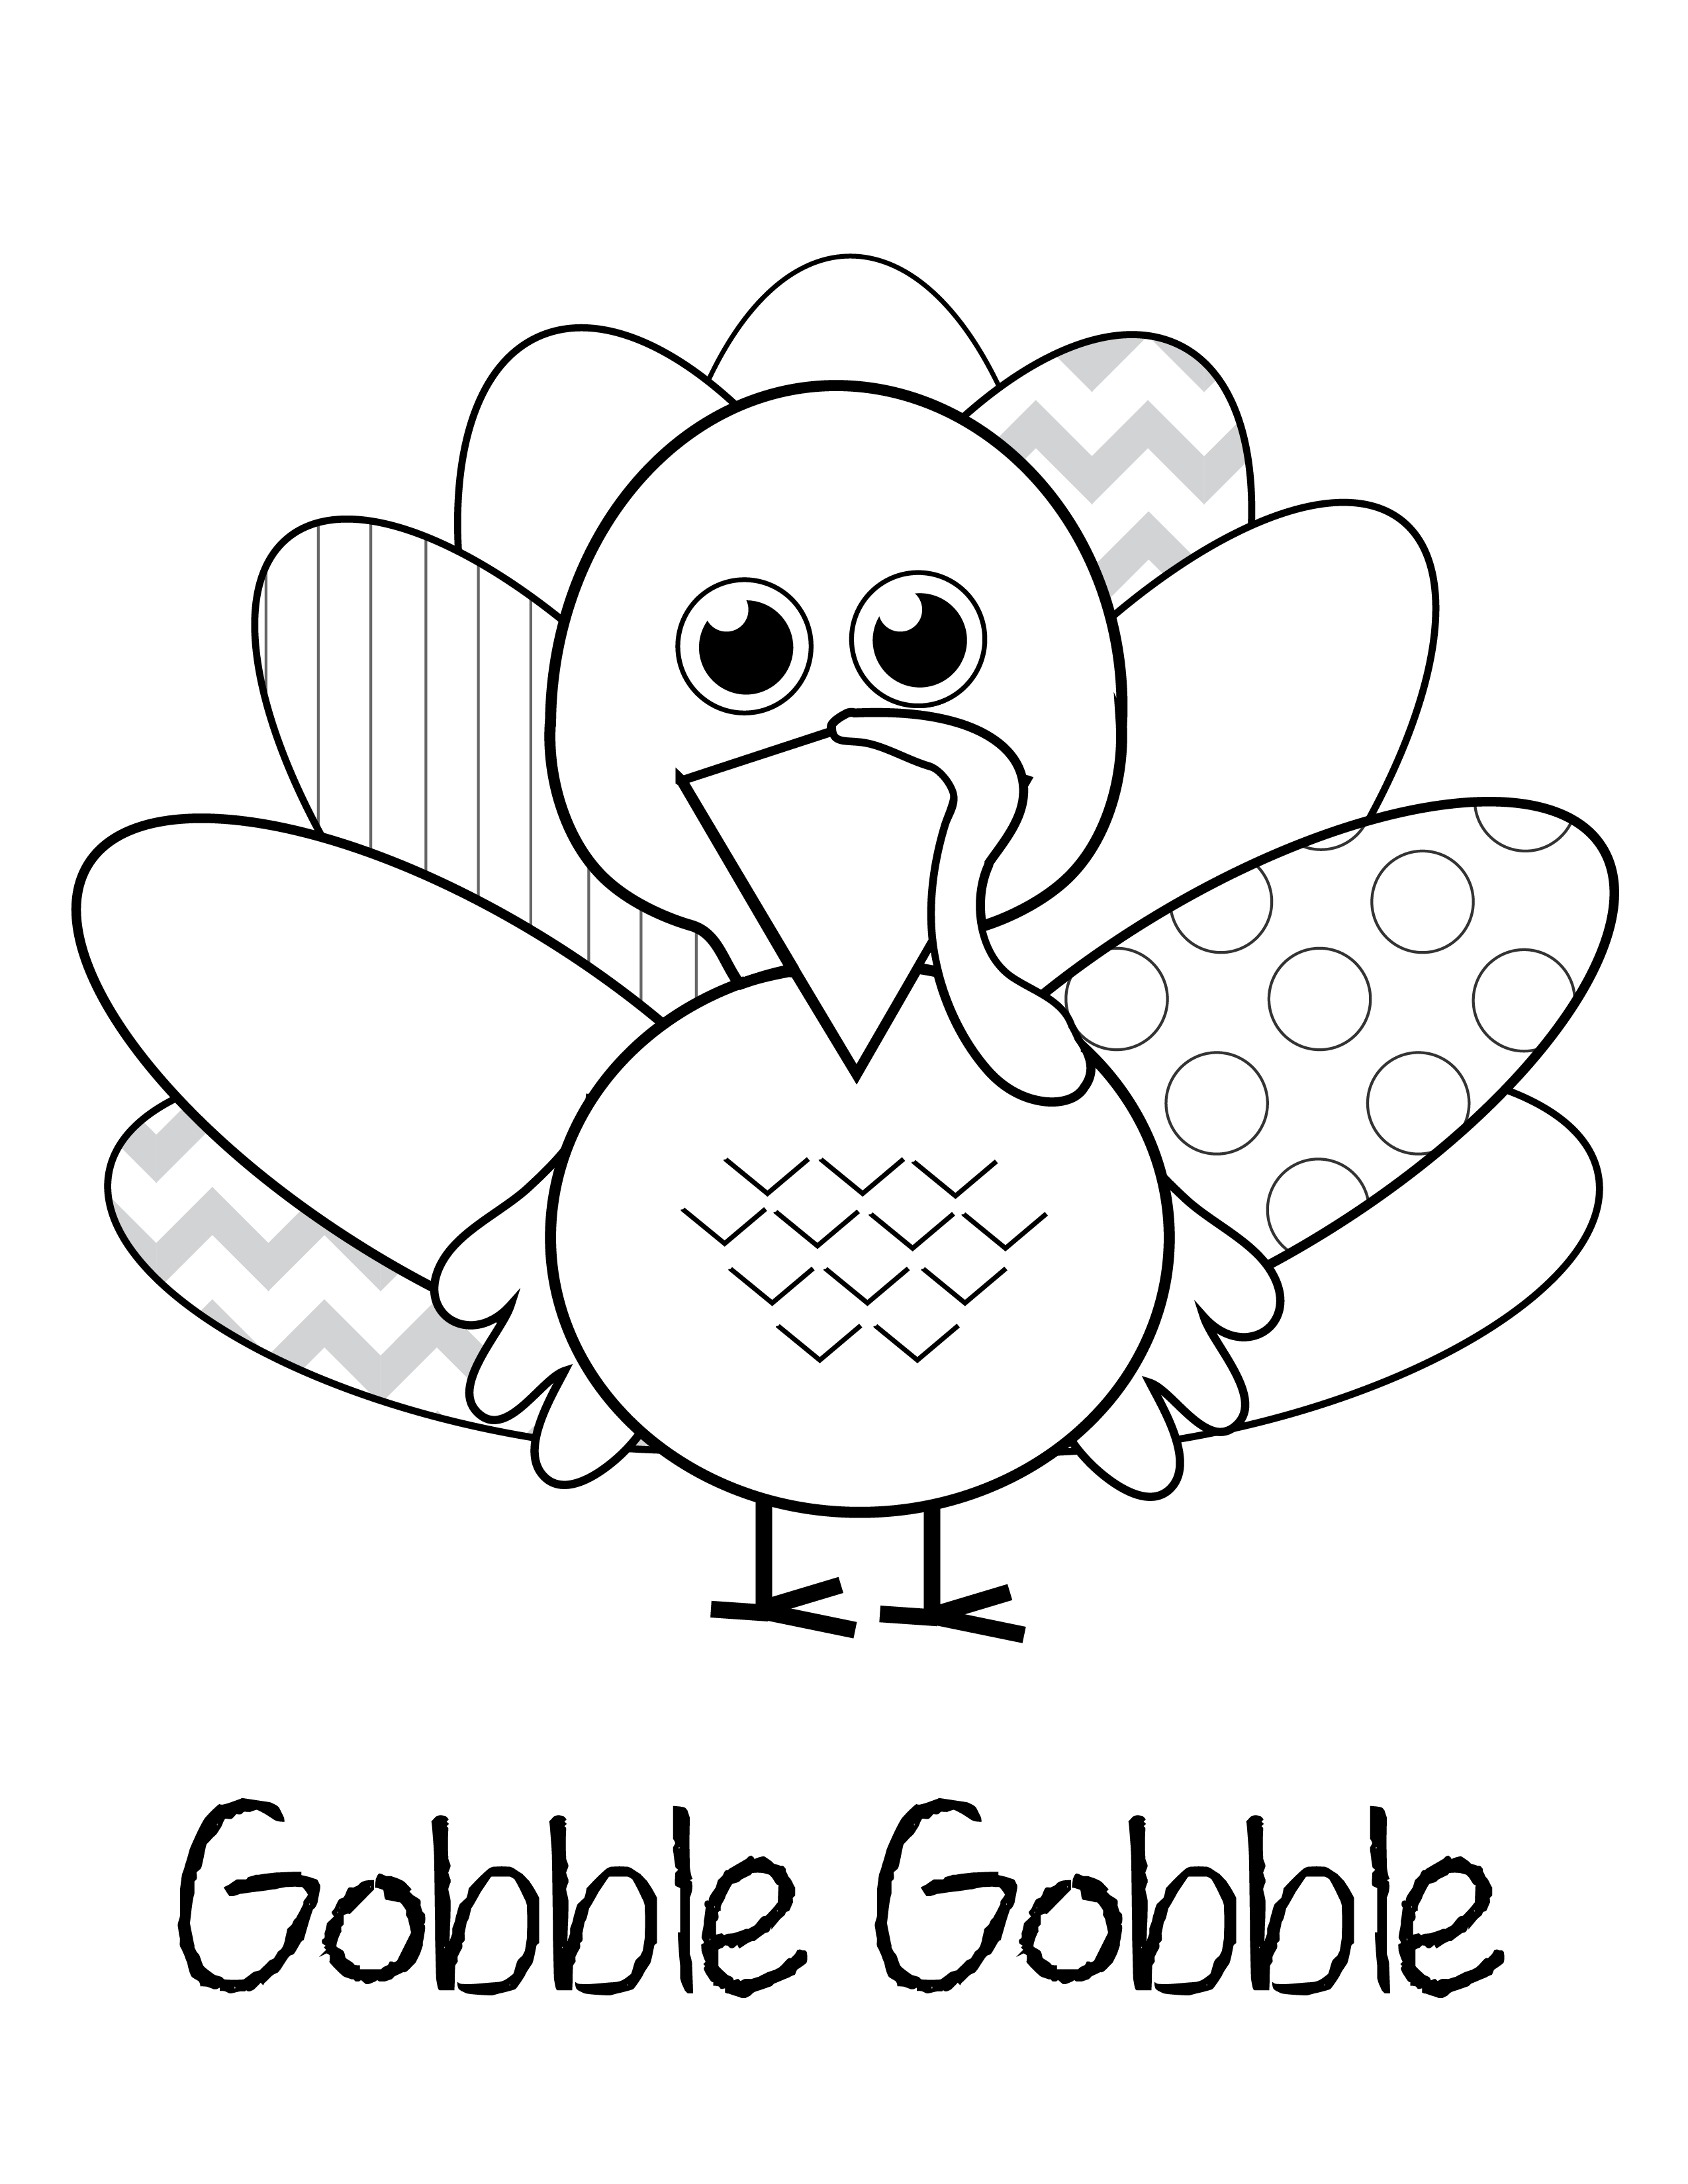 free turkey coloring pages free printable turkey coloring pages for kids cool2bkids coloring pages turkey free